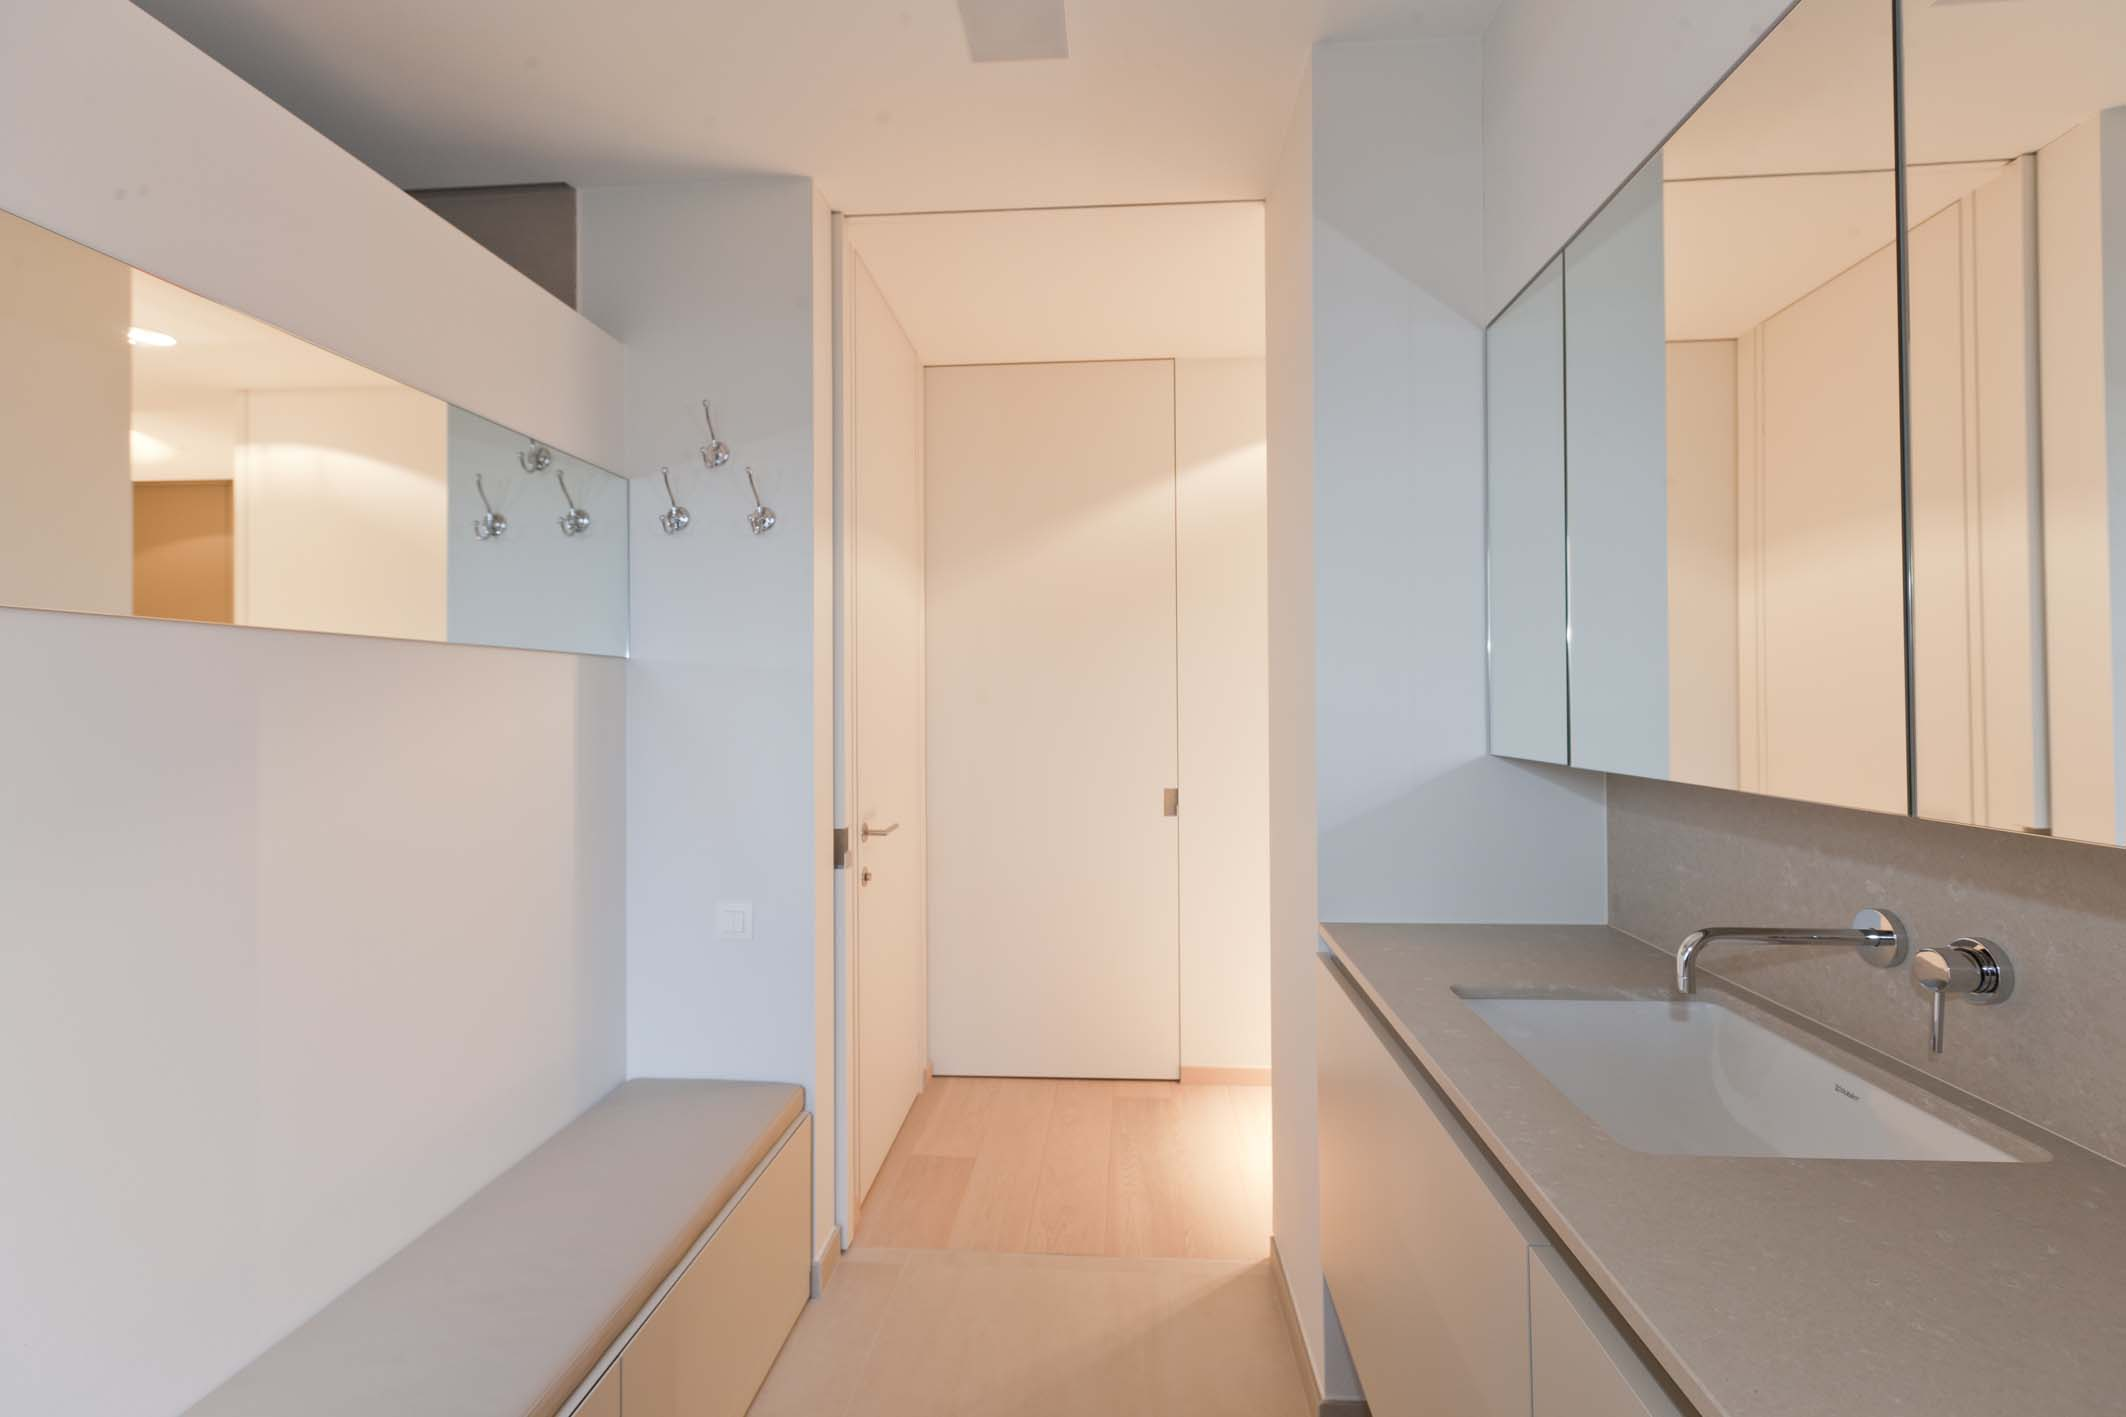 Project residentieel Harelbeke